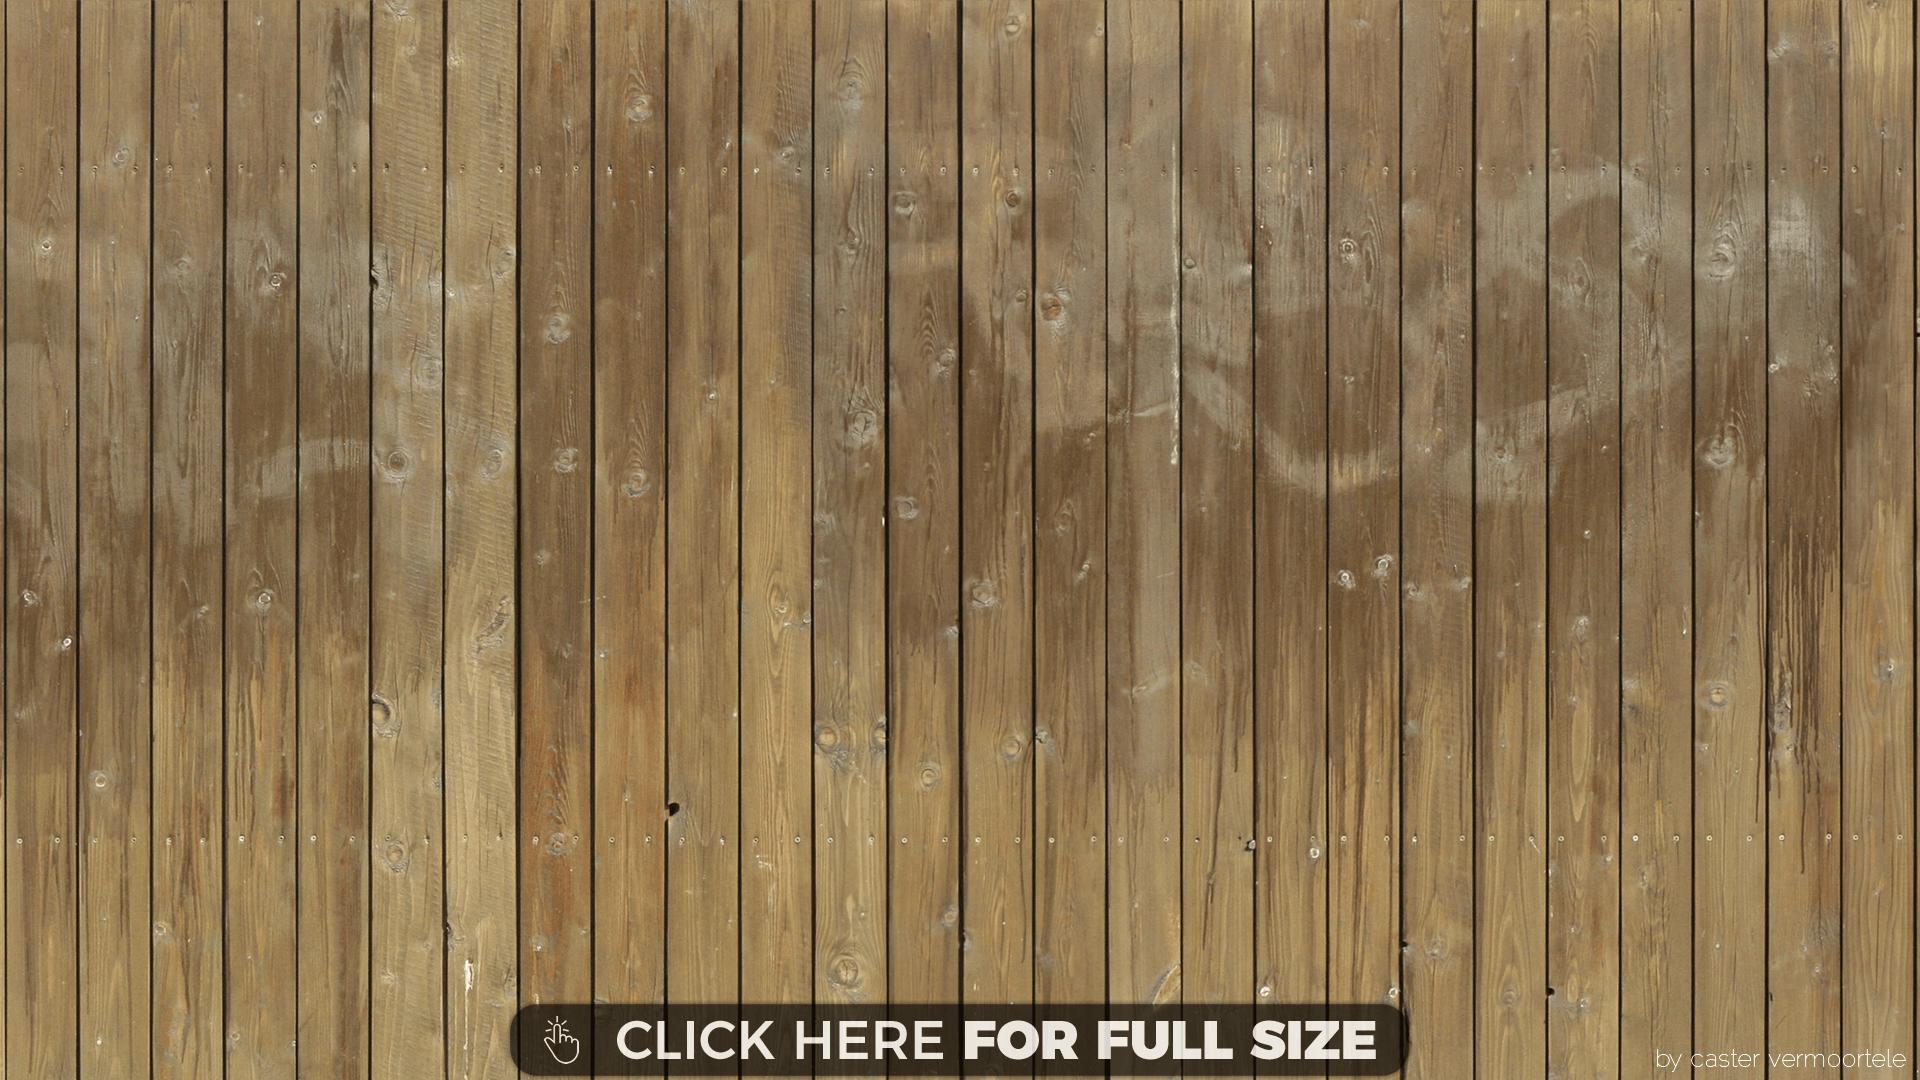 Explore Wooden Wallpaper Textured Wallpaper and more